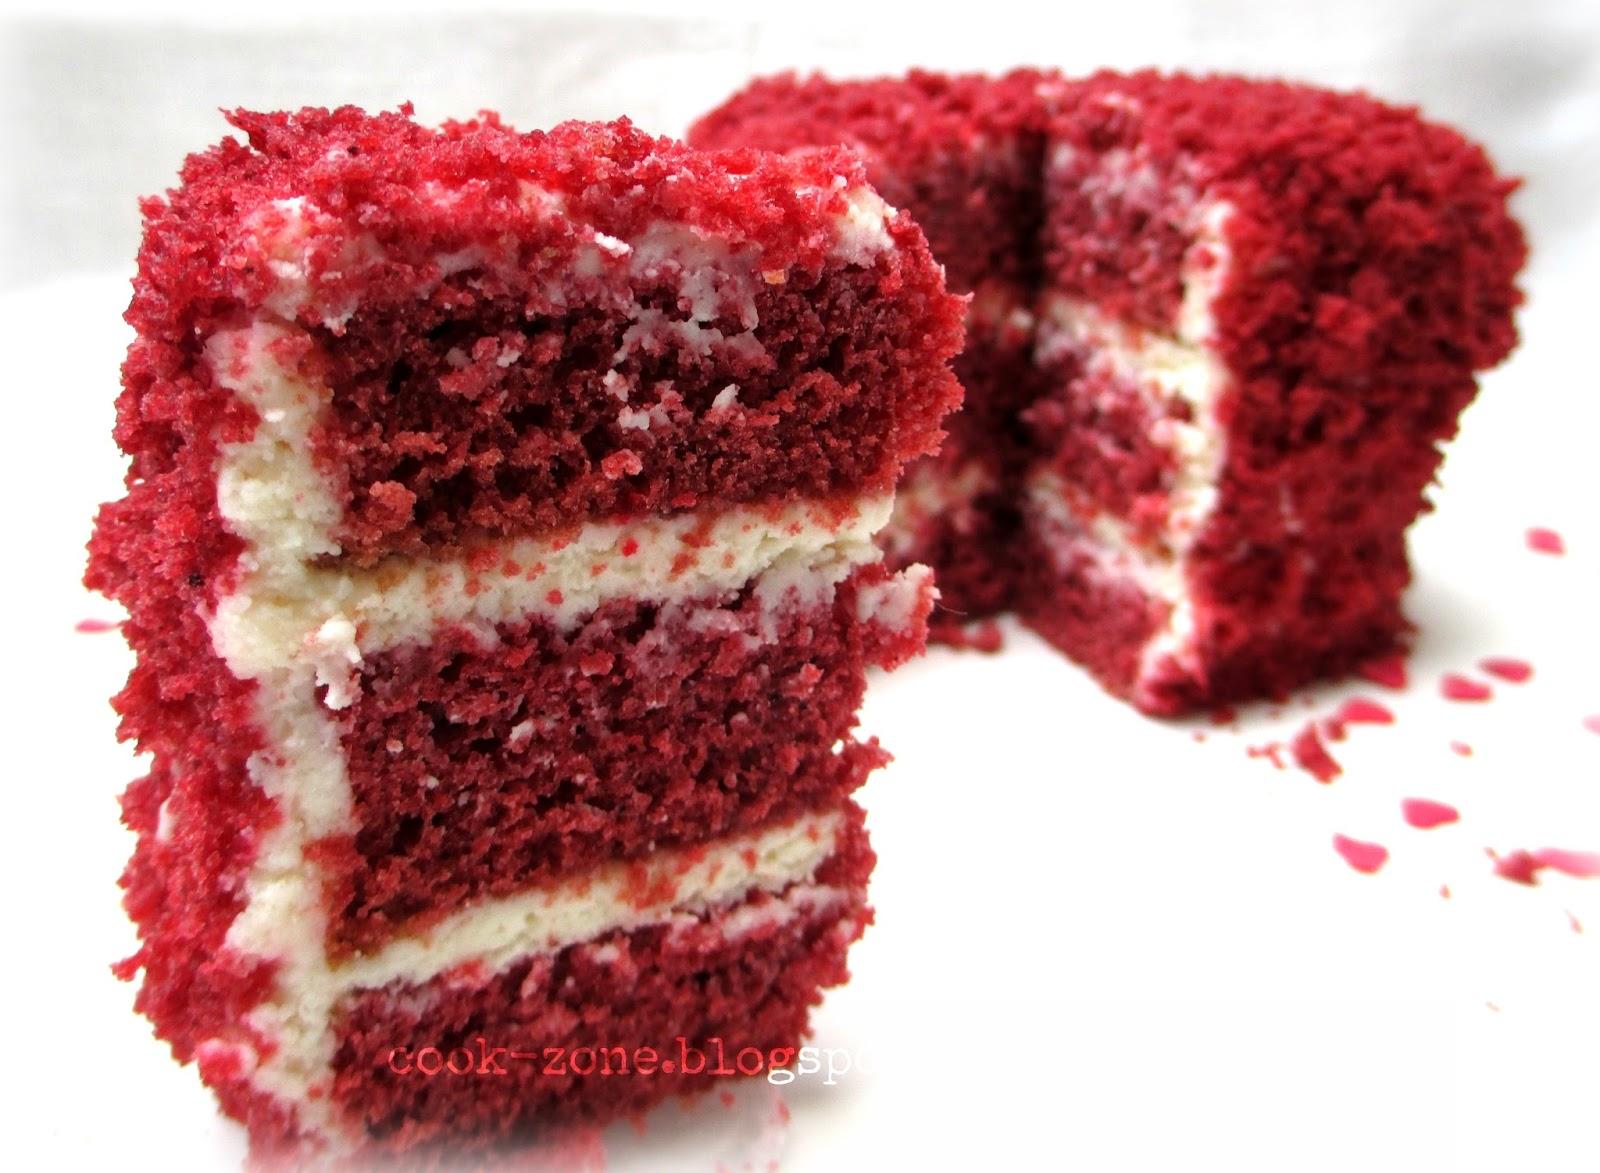 Red Velvet Pound Cake Made From Cake Mix